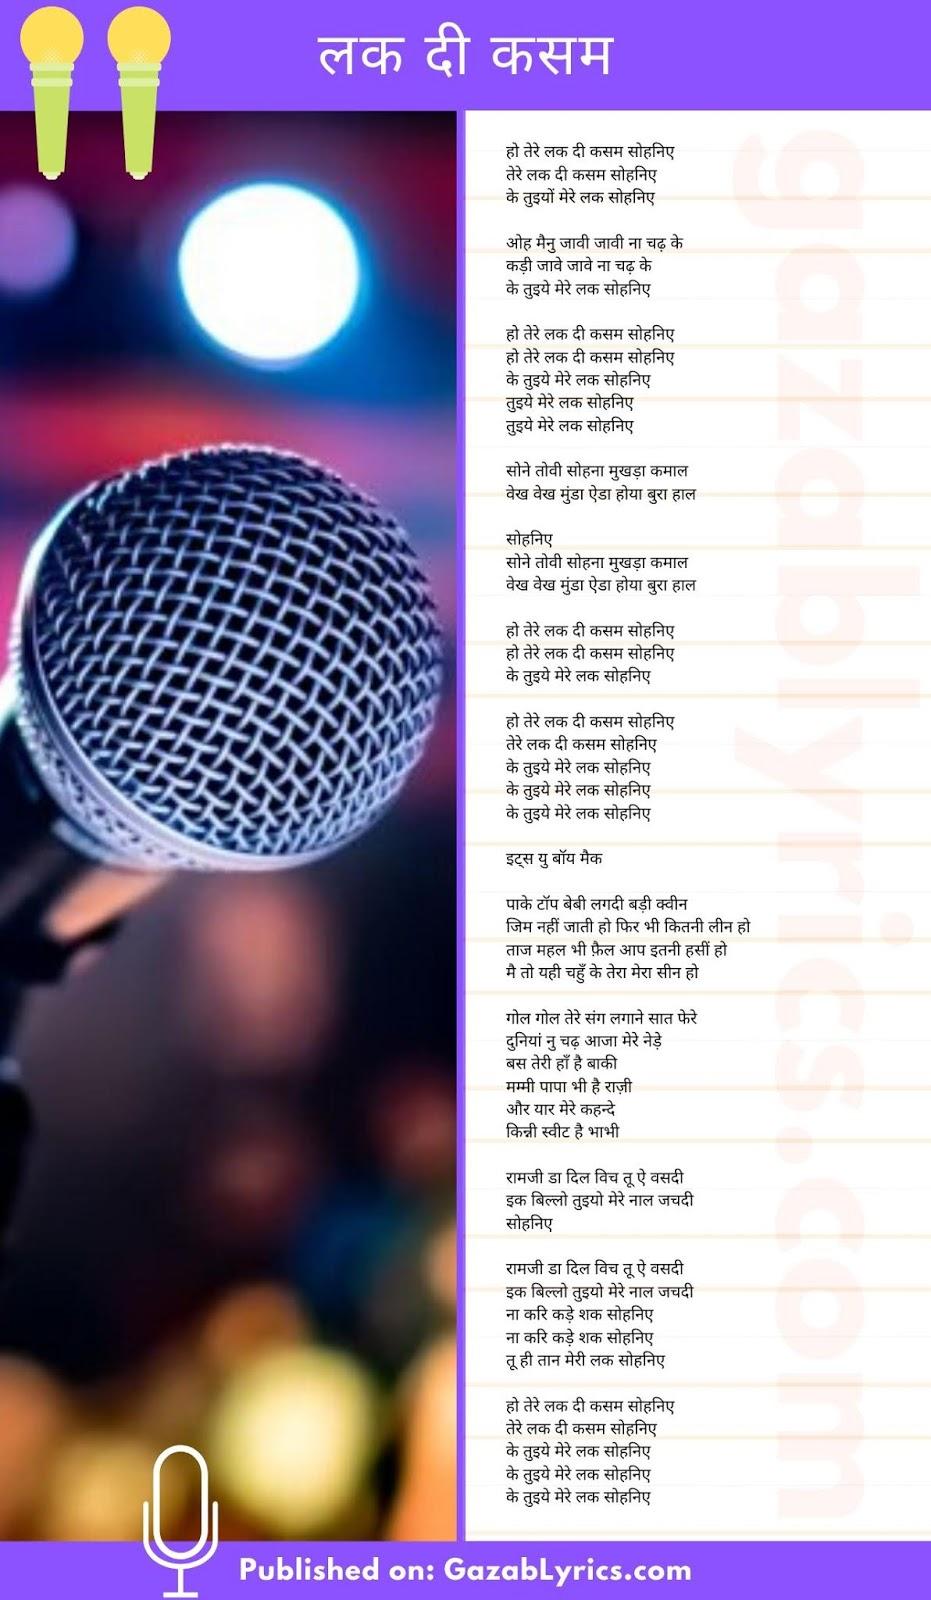 Luck Di Kasam song lyrics image